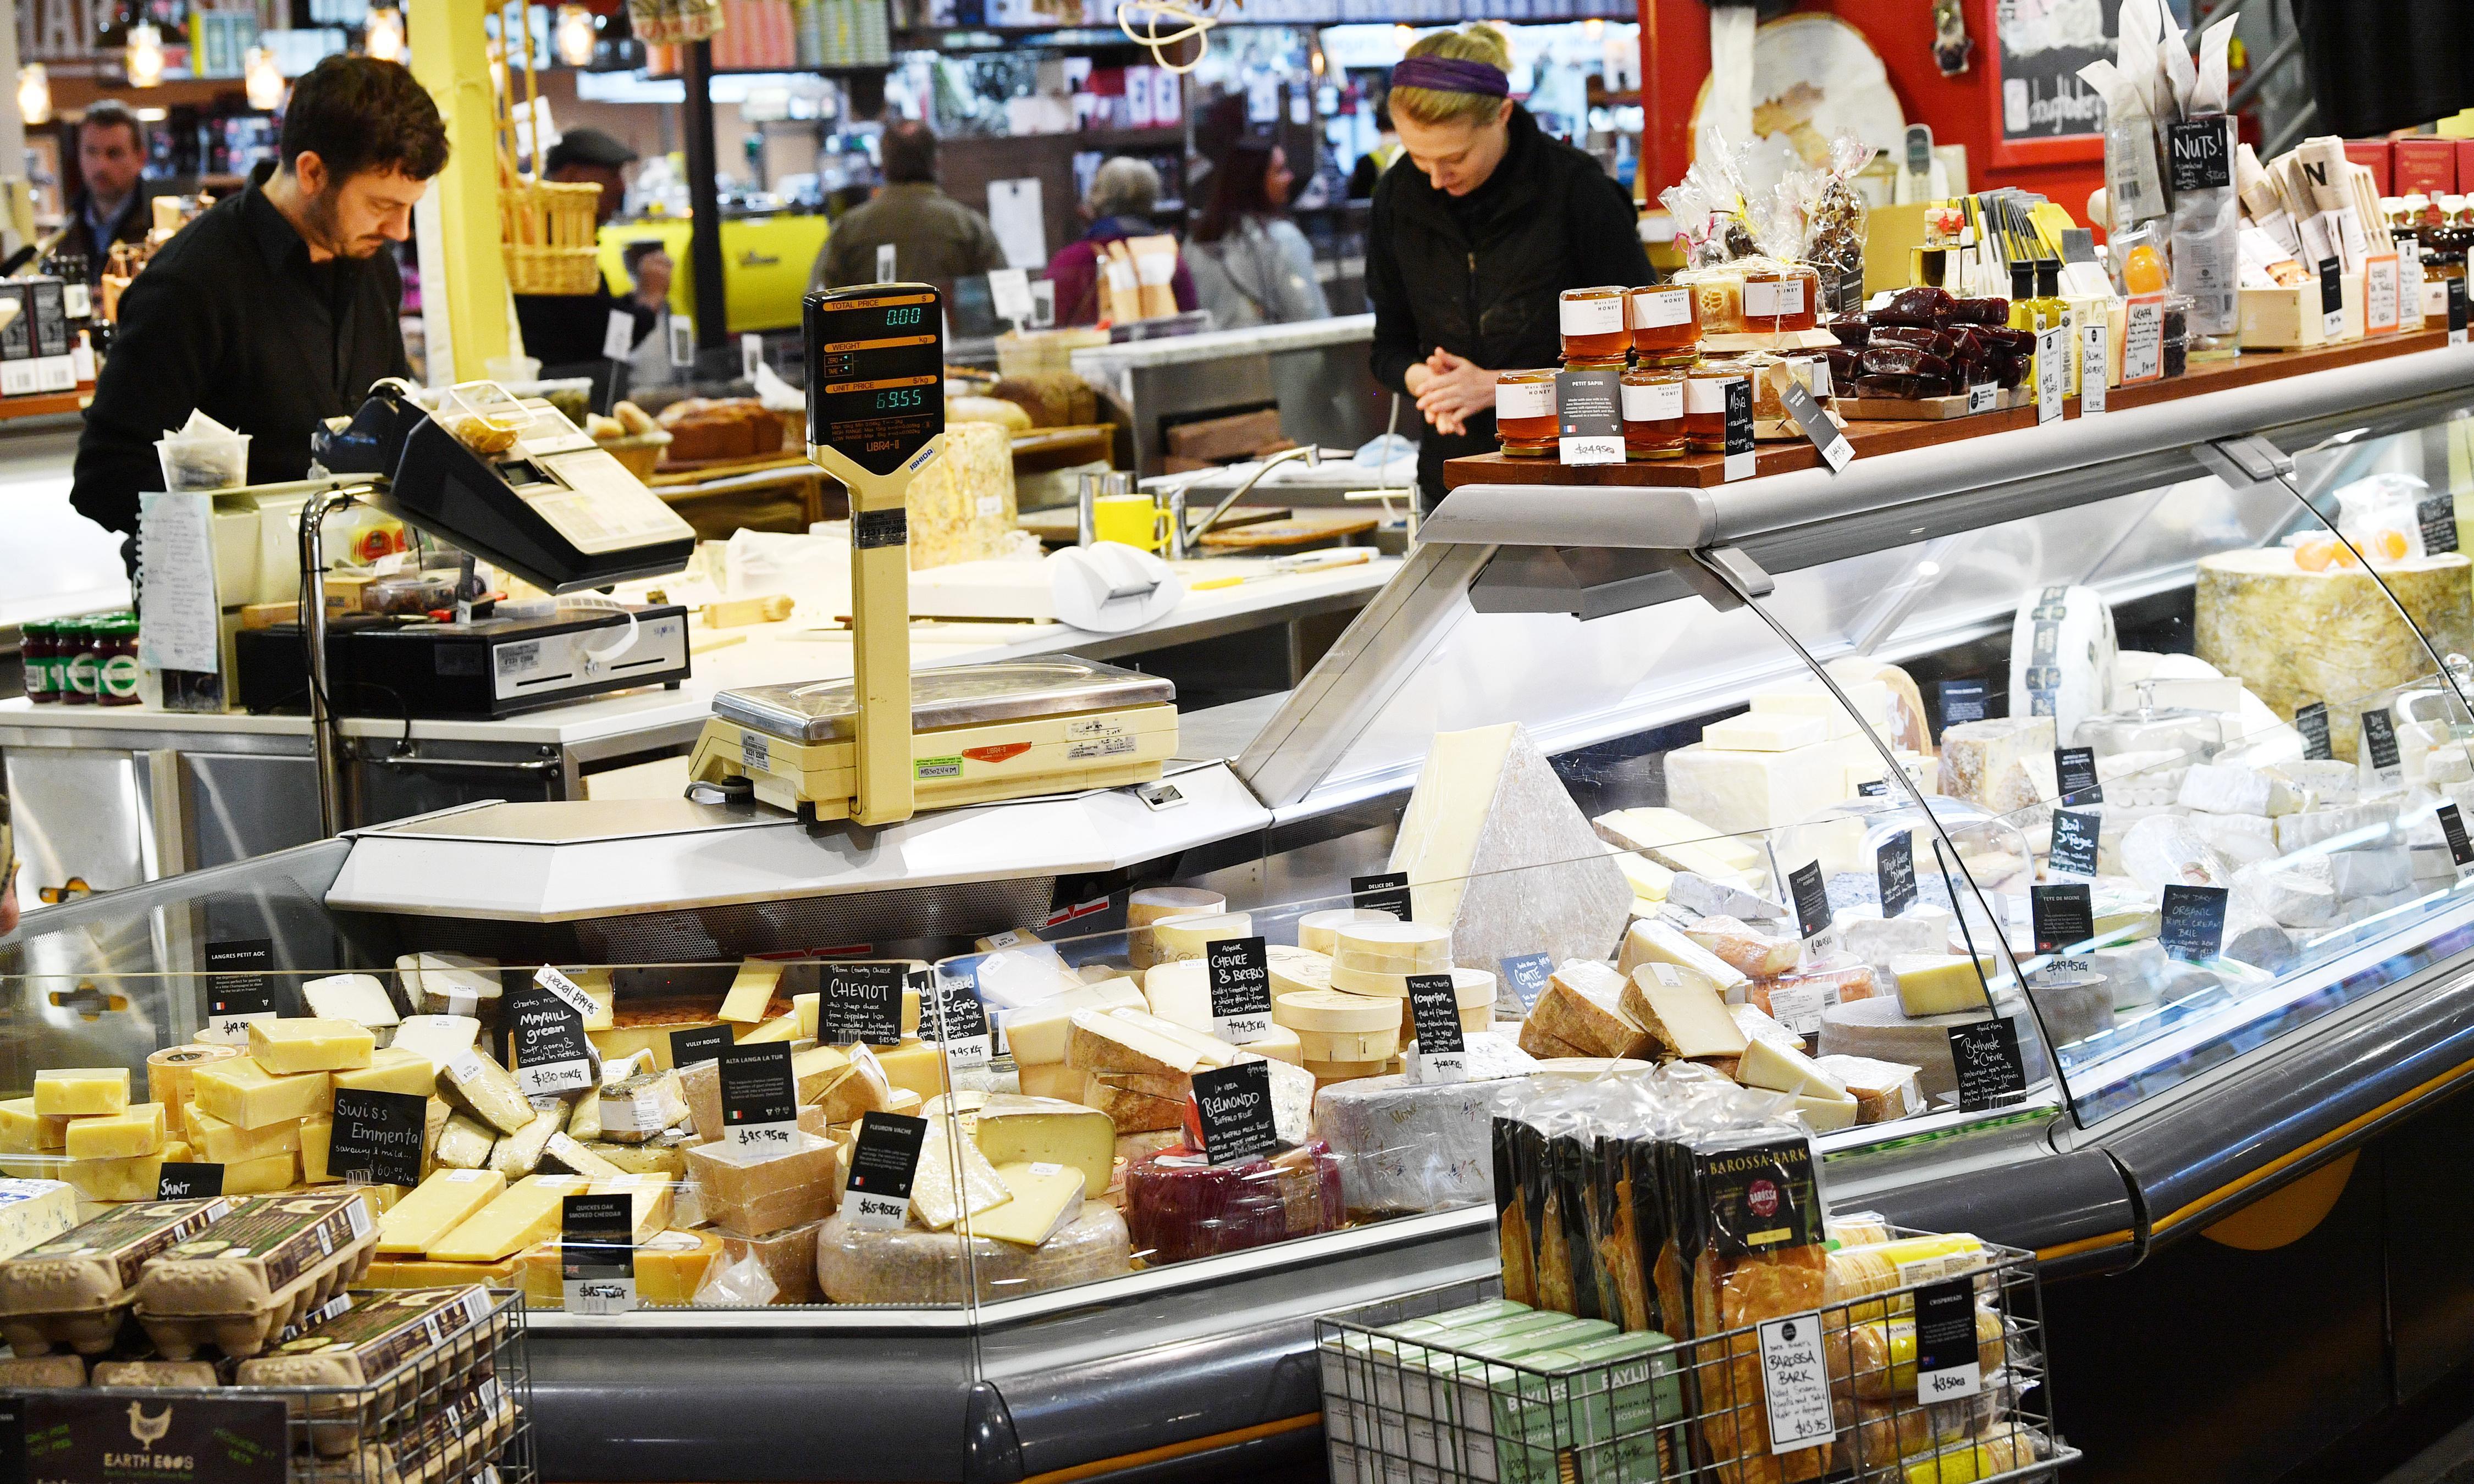 Australian cheesemakers warn EU name crackdown will cost jobs